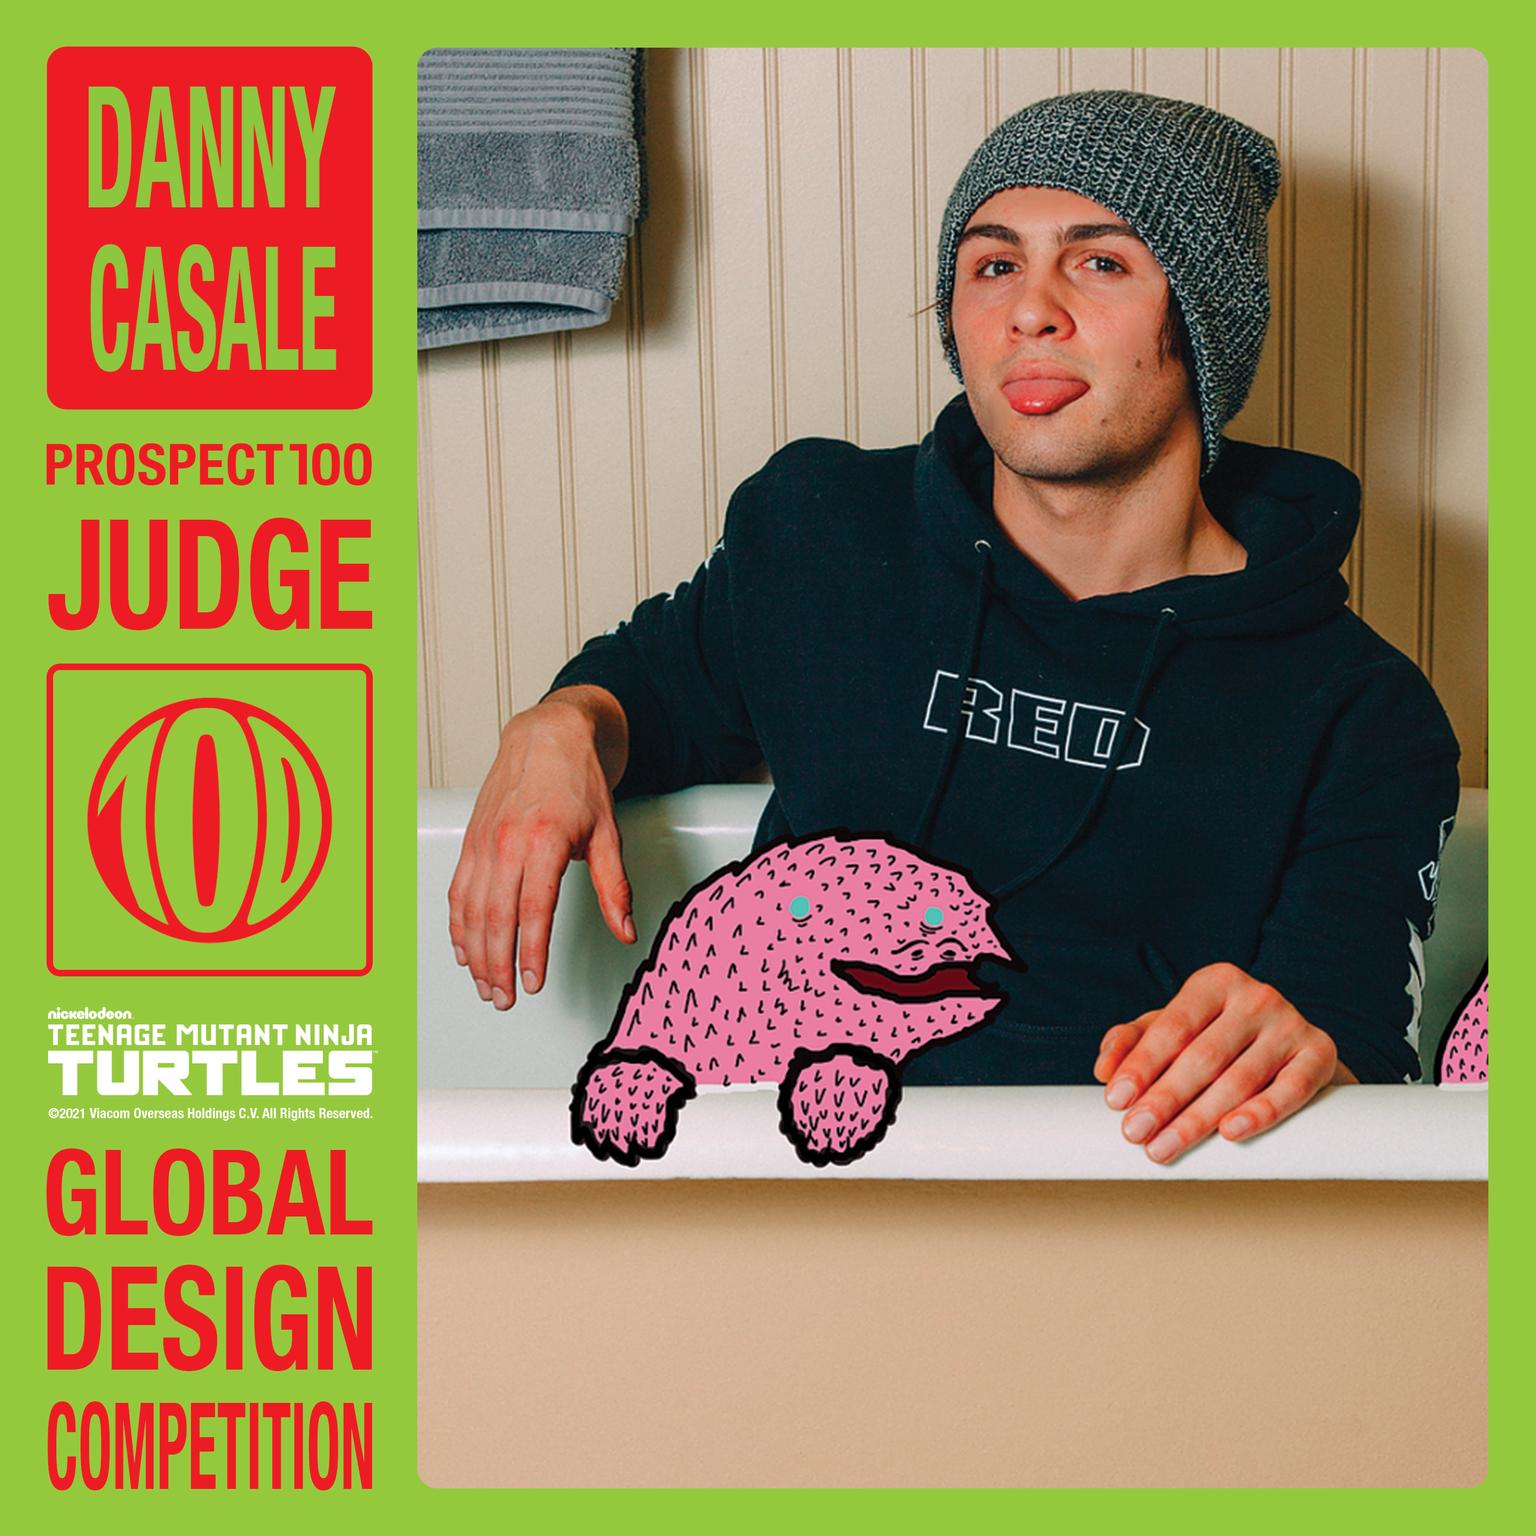 Danny Casale